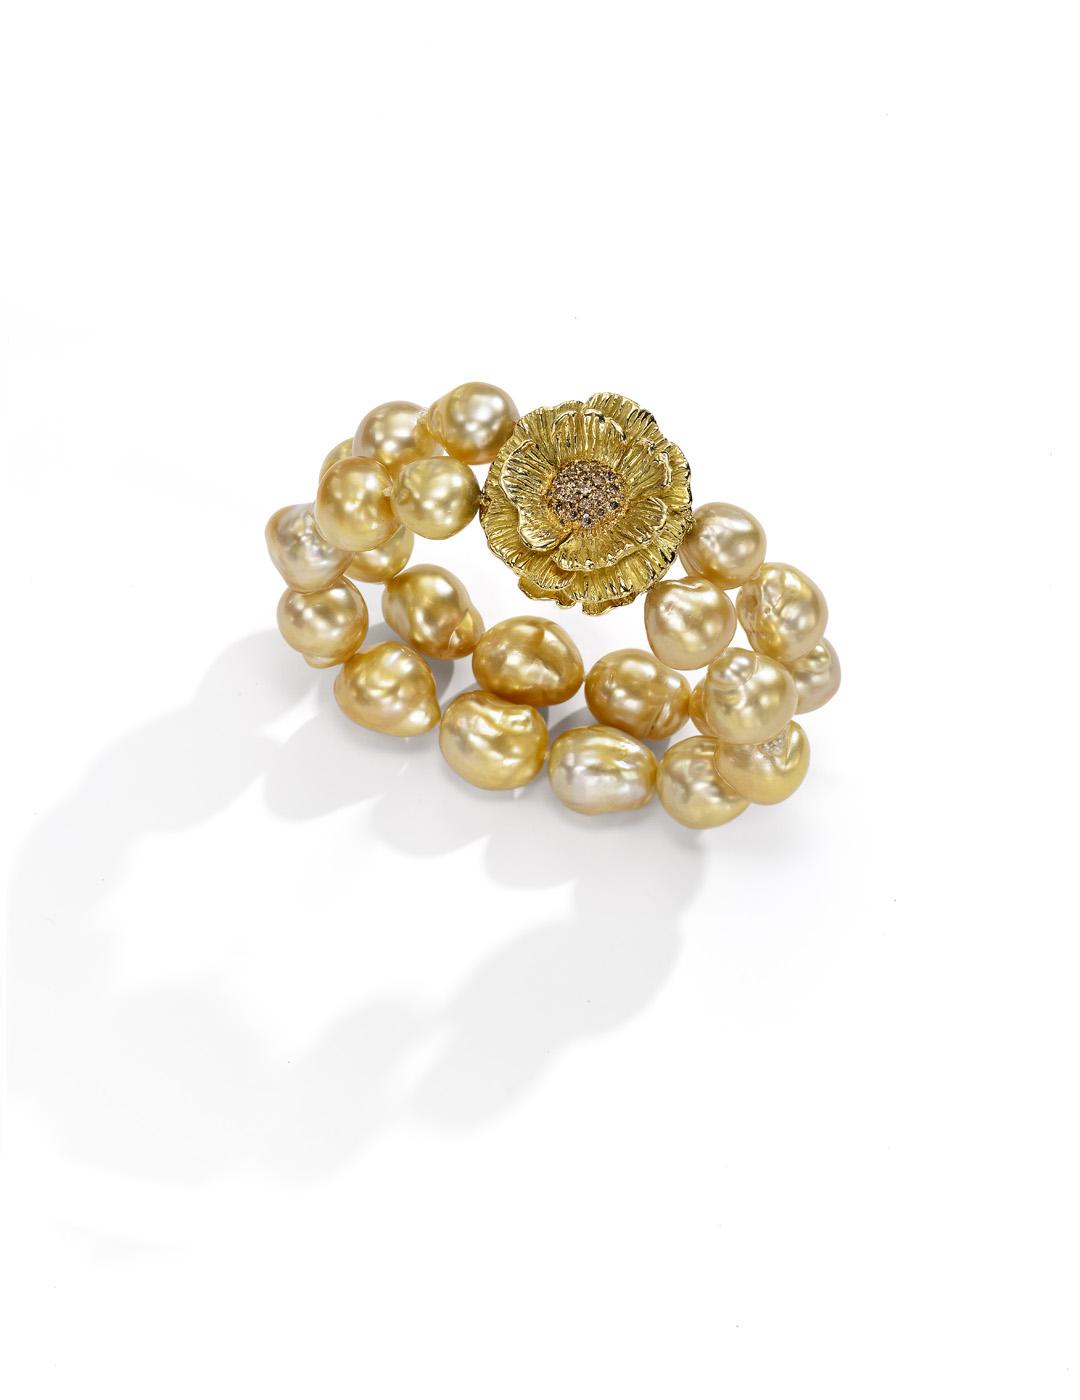 mish_jewelry_product_Poppy-Clasp-BR-5